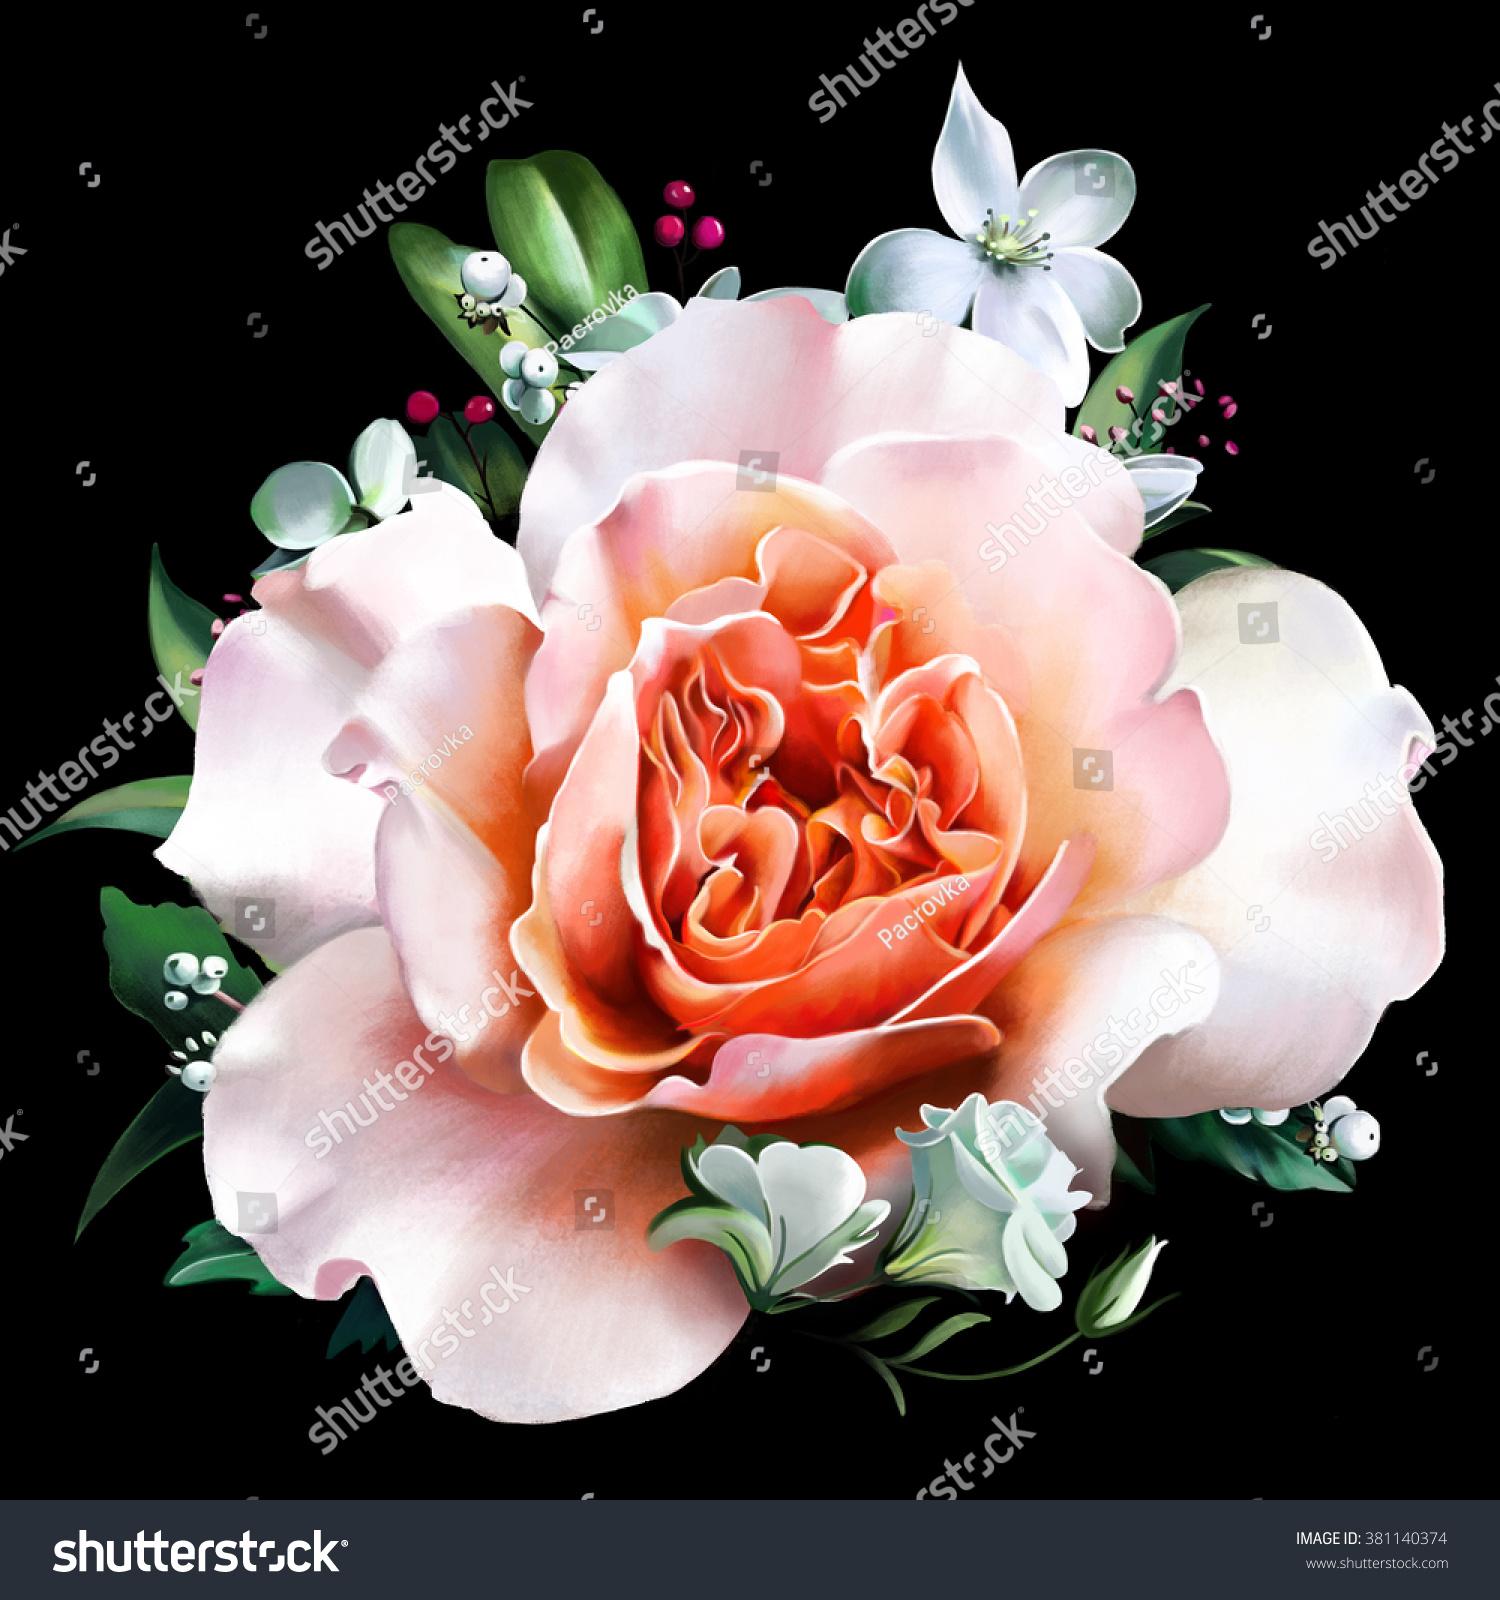 beautiful pink rose on black background stock illustration